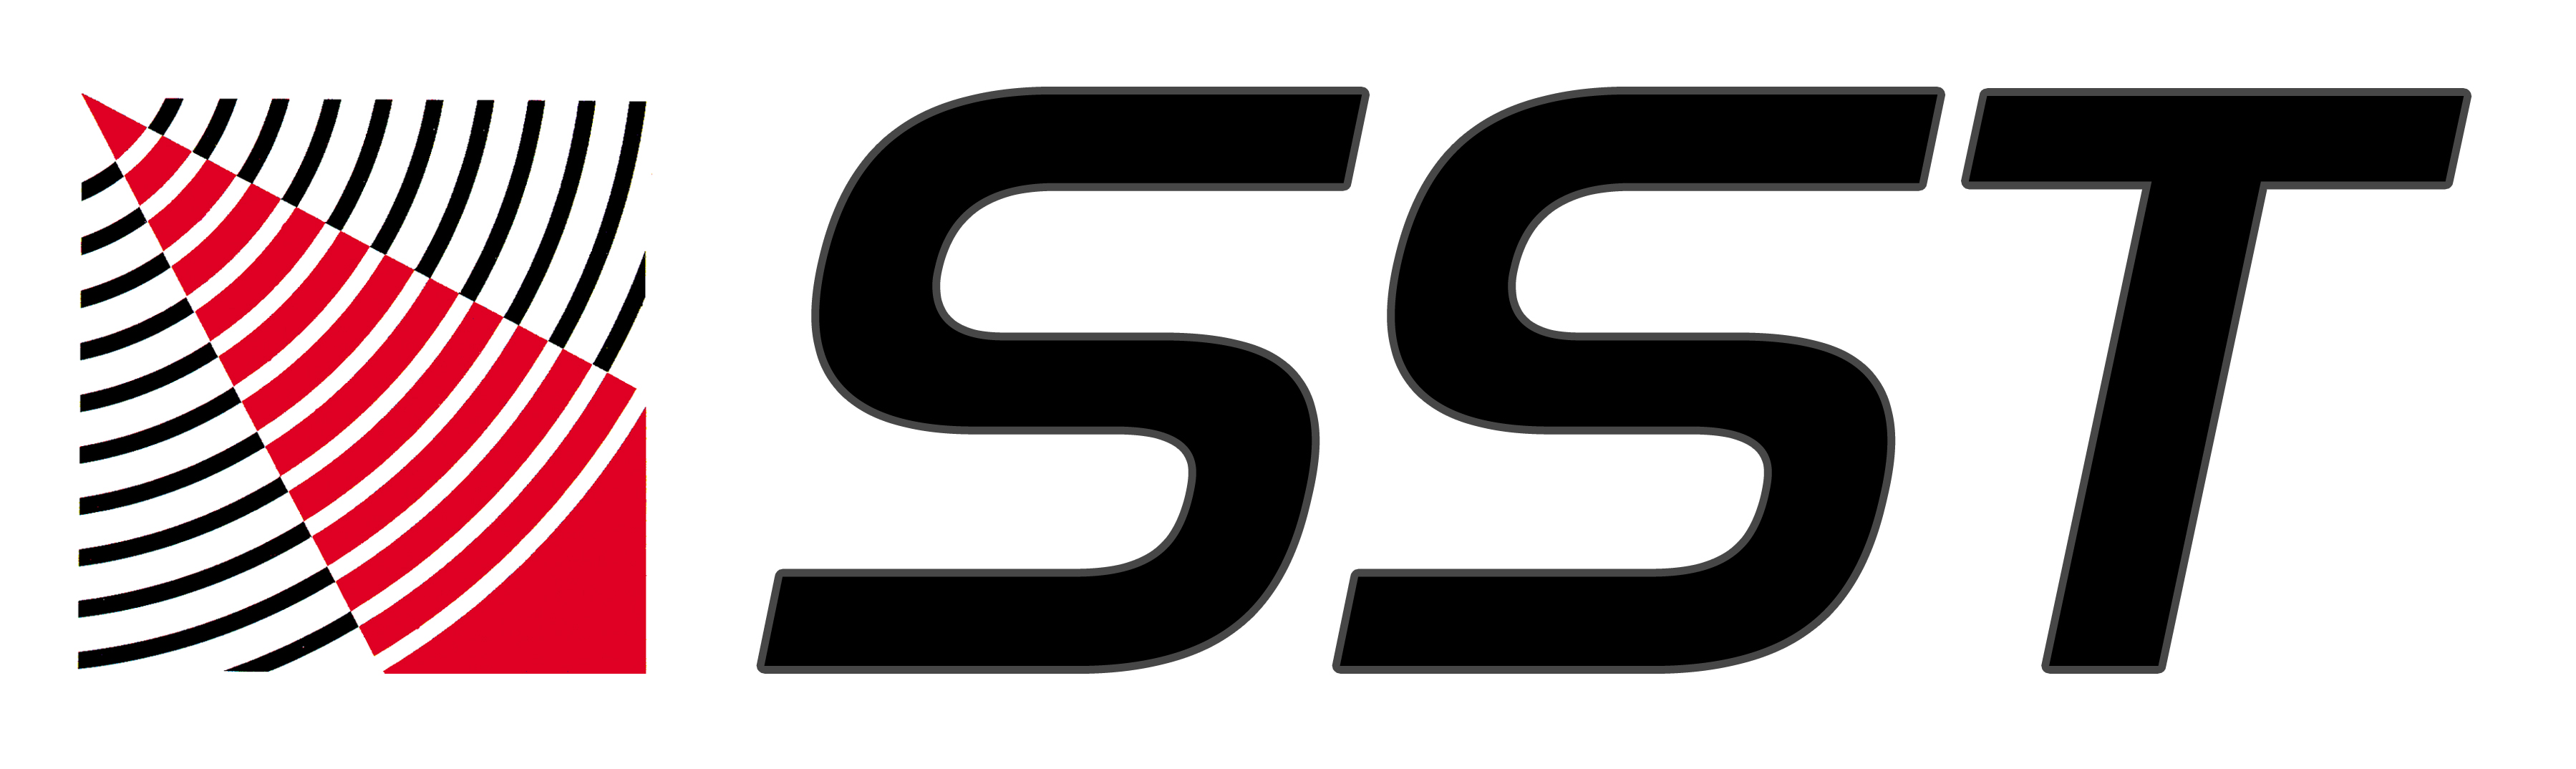 logo redesign   creative gyeenius website design orange